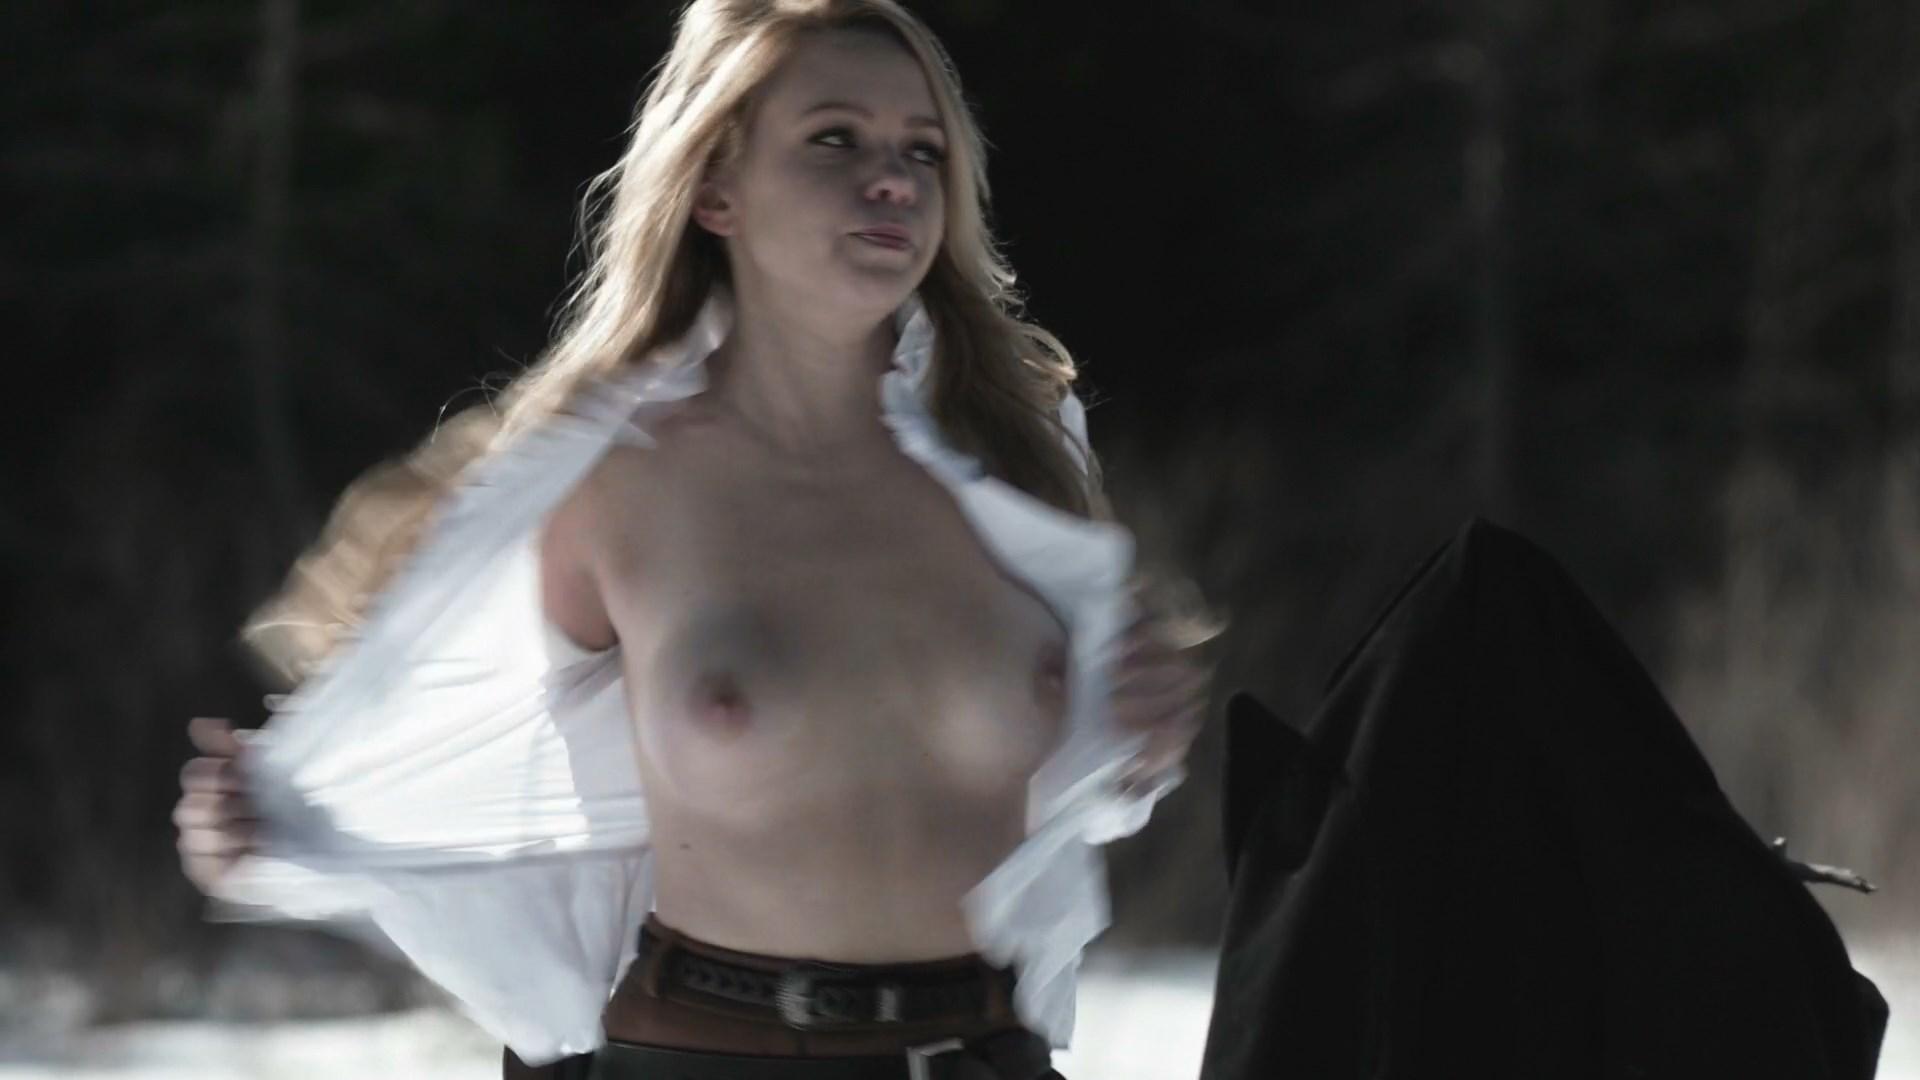 Karin Brauns Nude